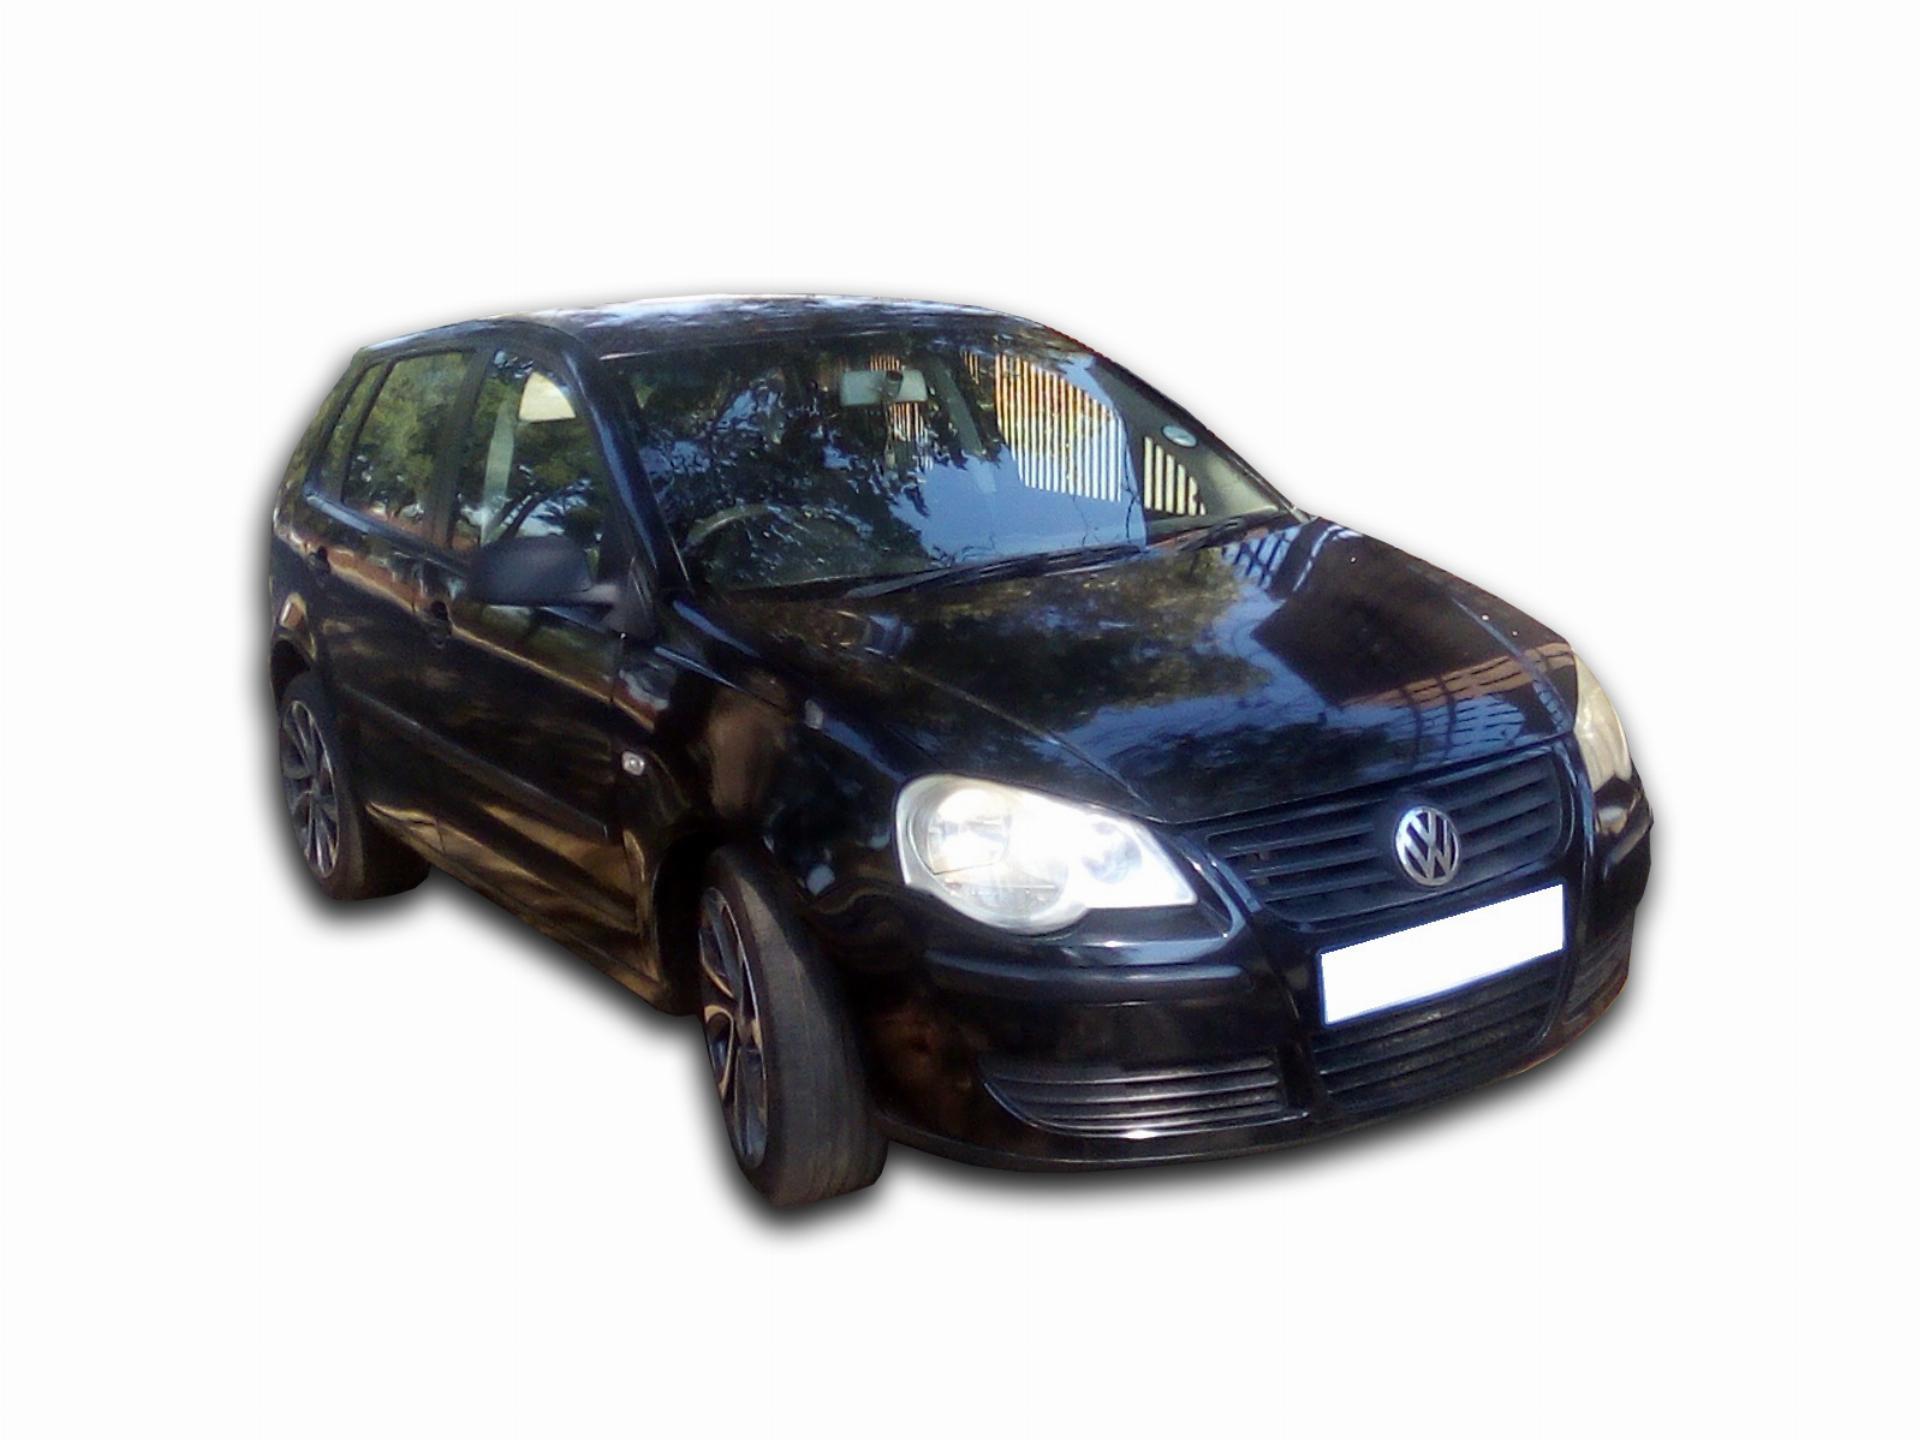 VW Polo Bujwa